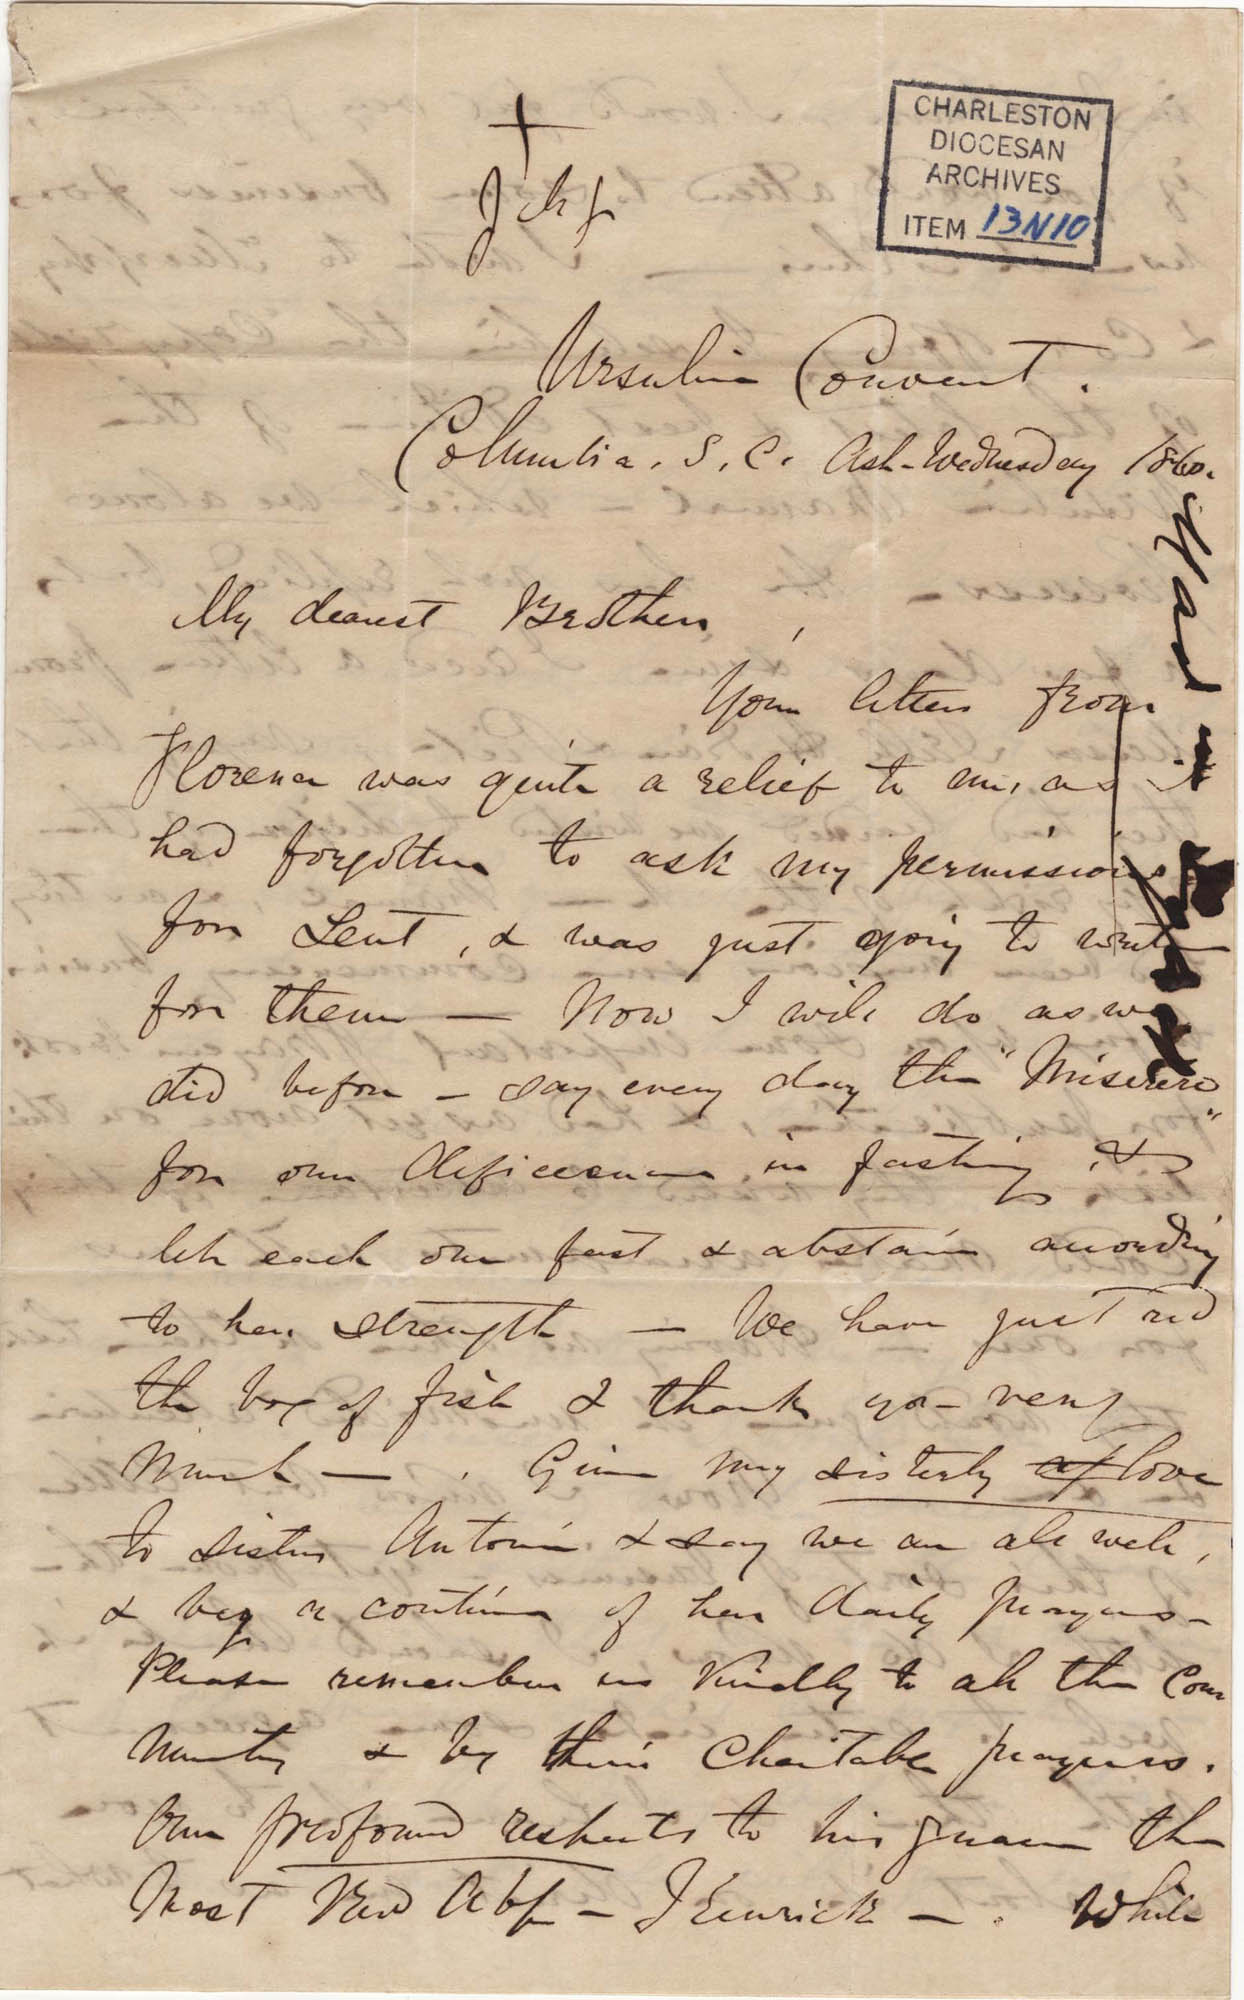 093. Madame Baptiste to Bp Patrick Lynch -- February 22, 1860